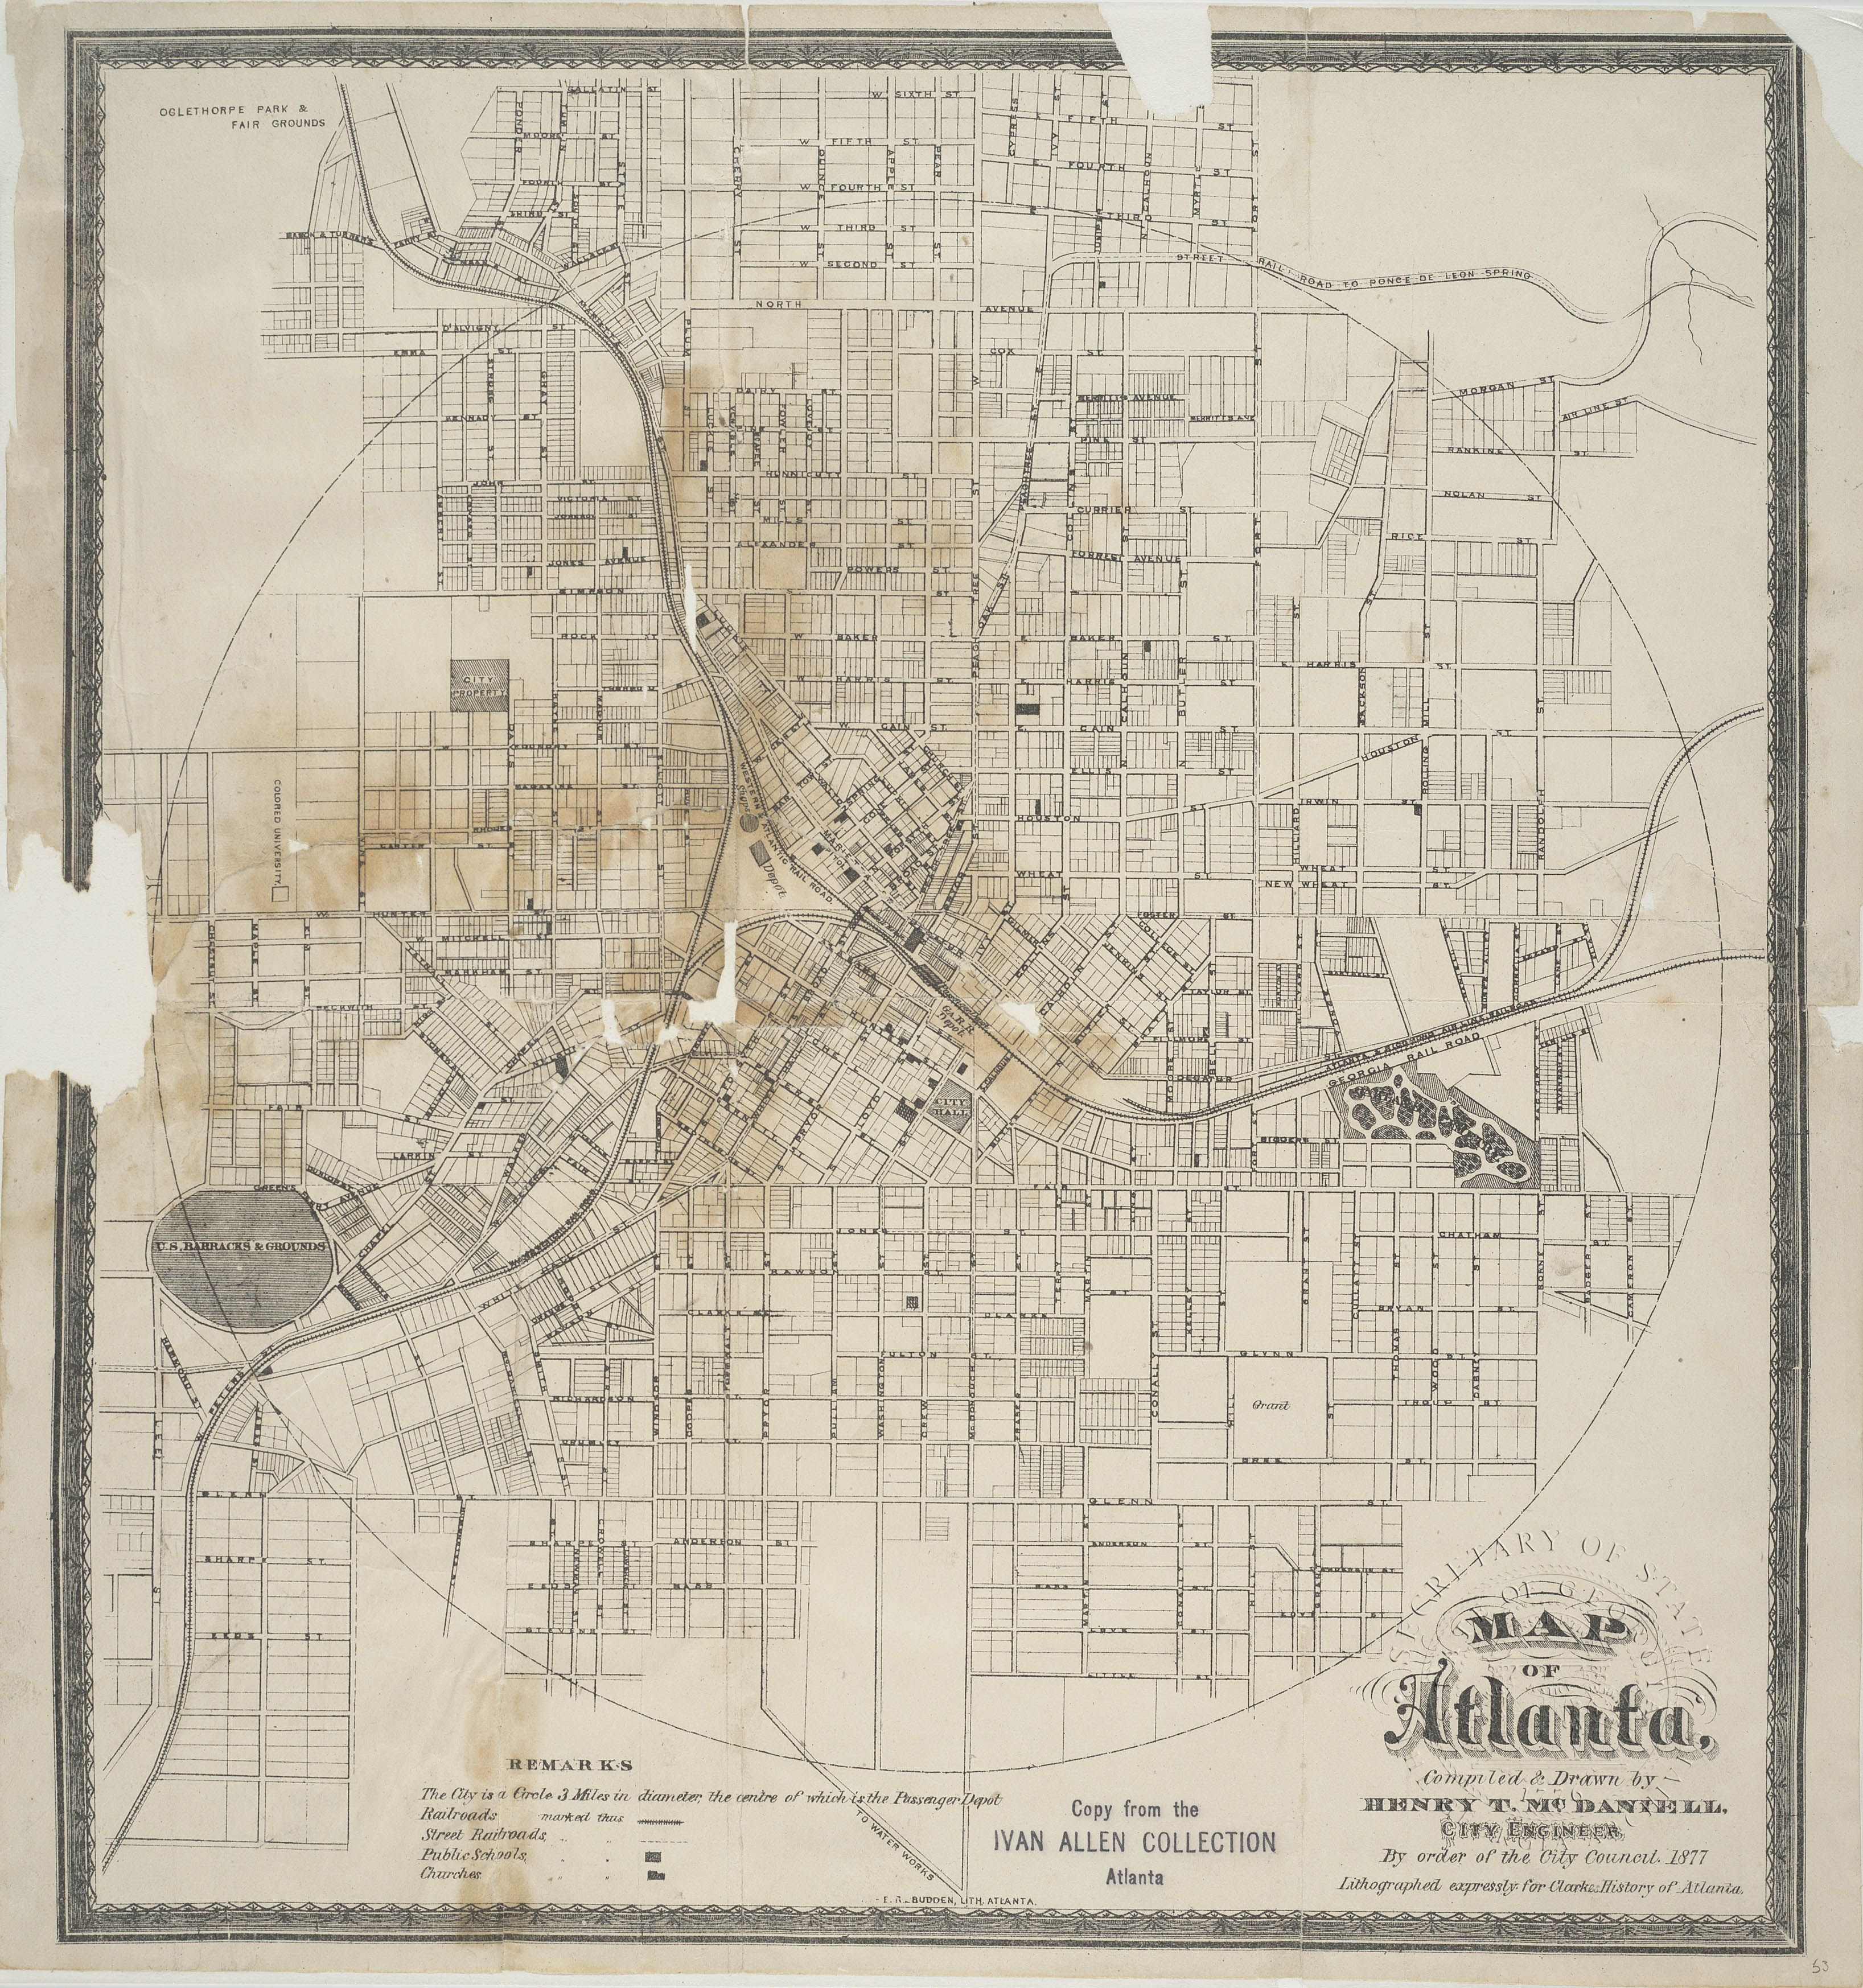 Map Of Atlanta 1877 Atlanta Map Atlanta City Old Map